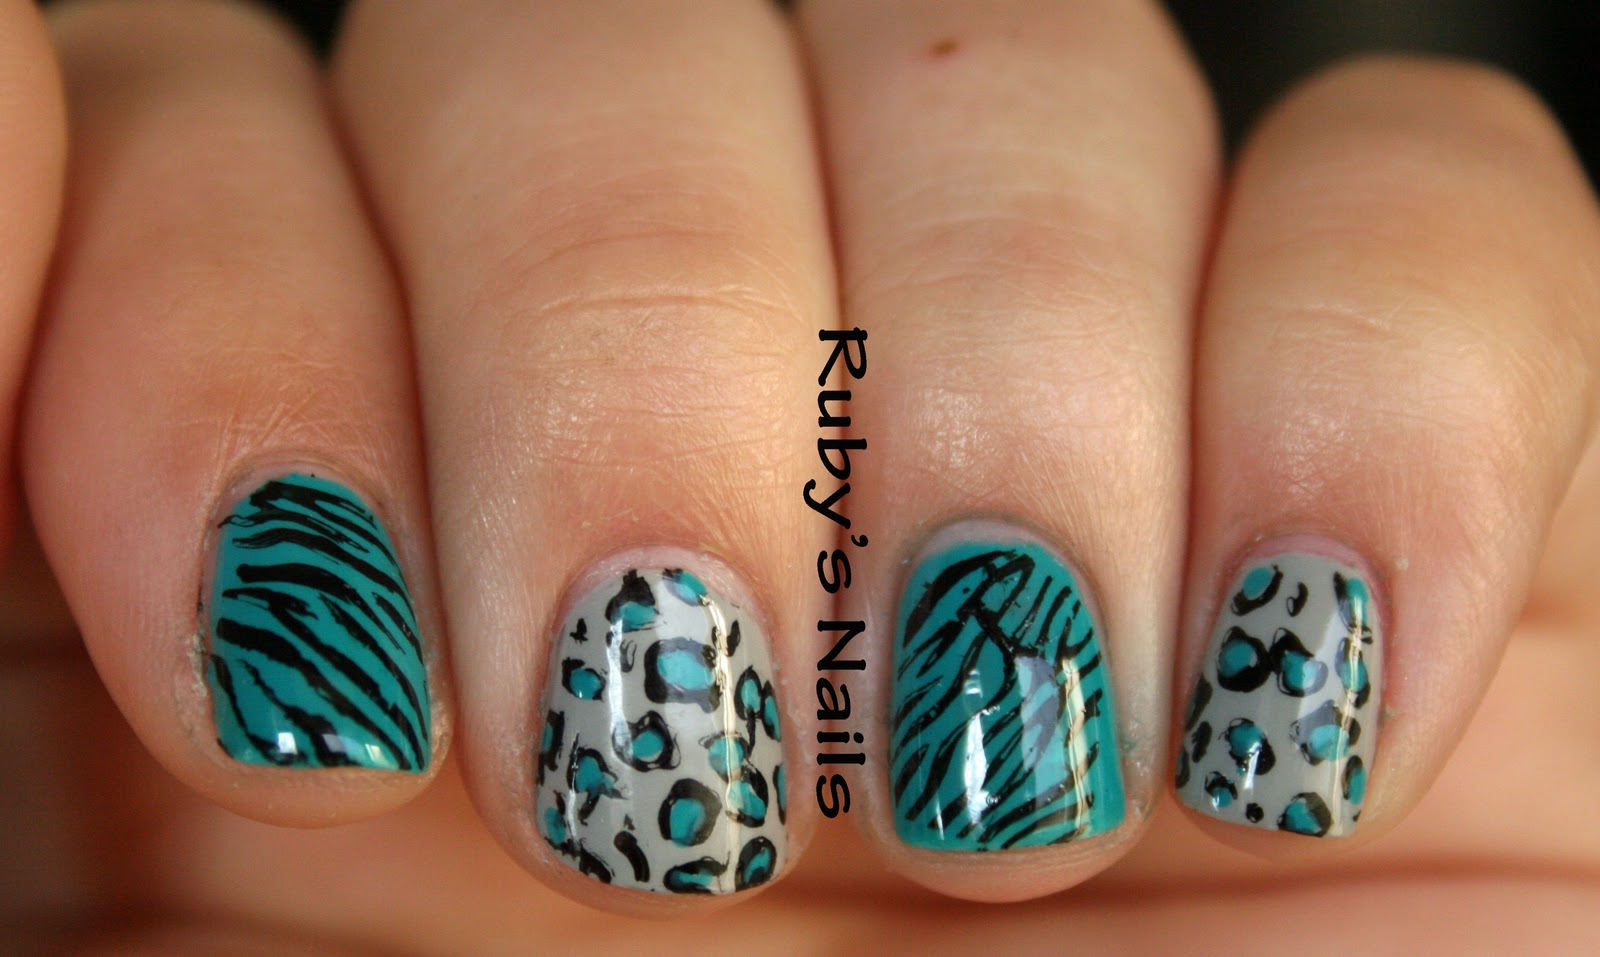 Zebra Print Nail Designs Acrylic Nails - 2015 Best Nails ...